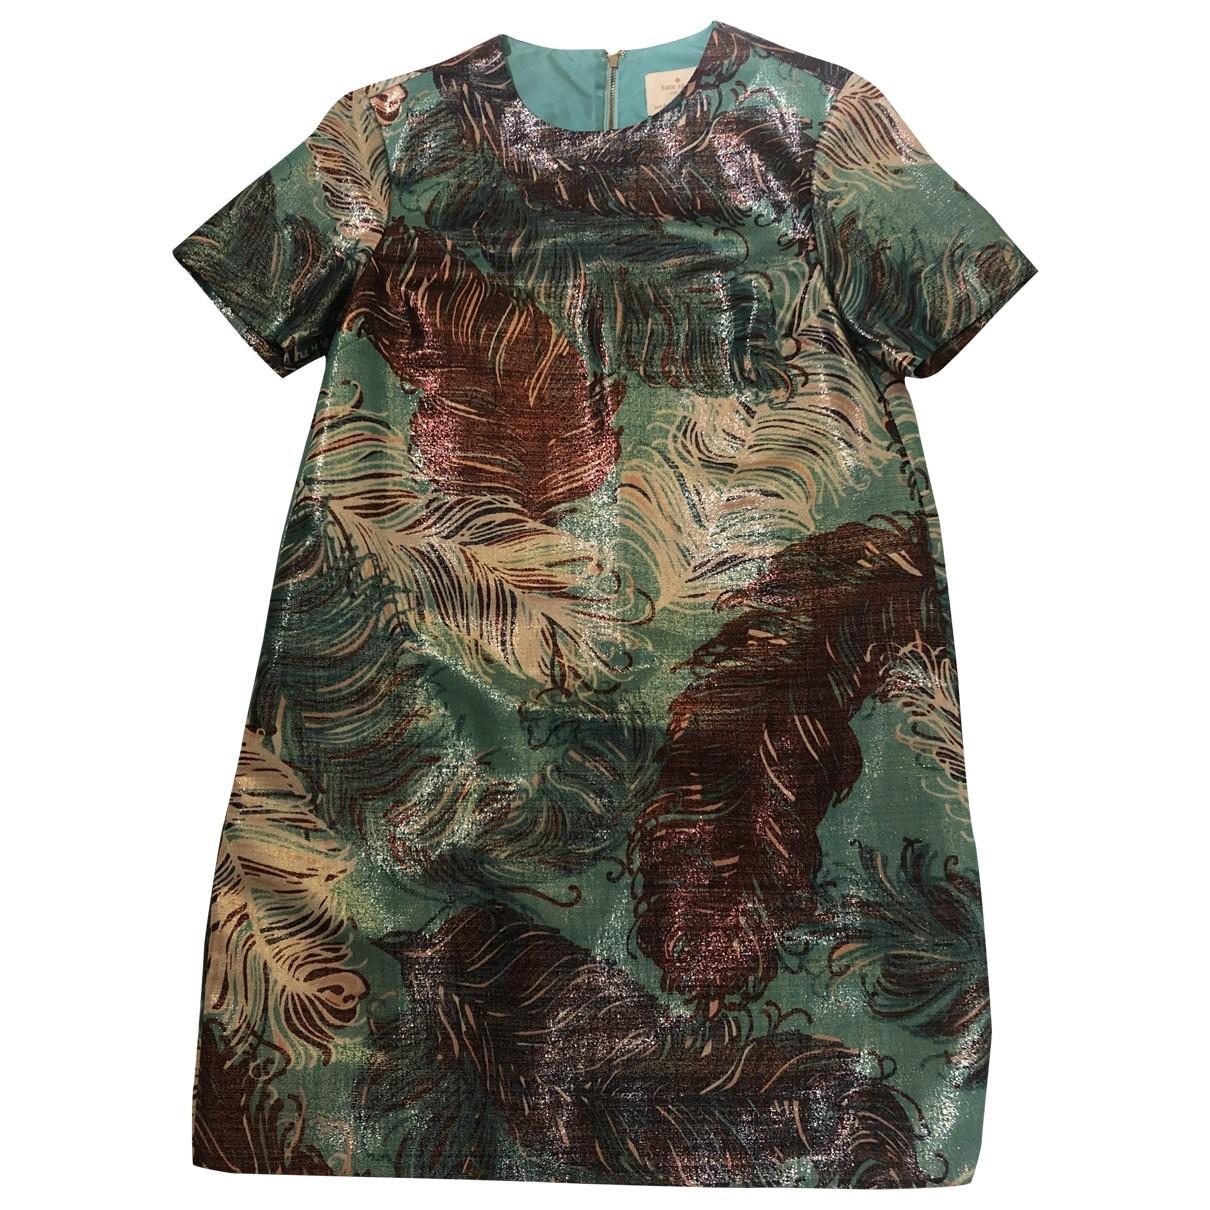 Kate Spade \N Kleid in  Metallic Mit Pailletten